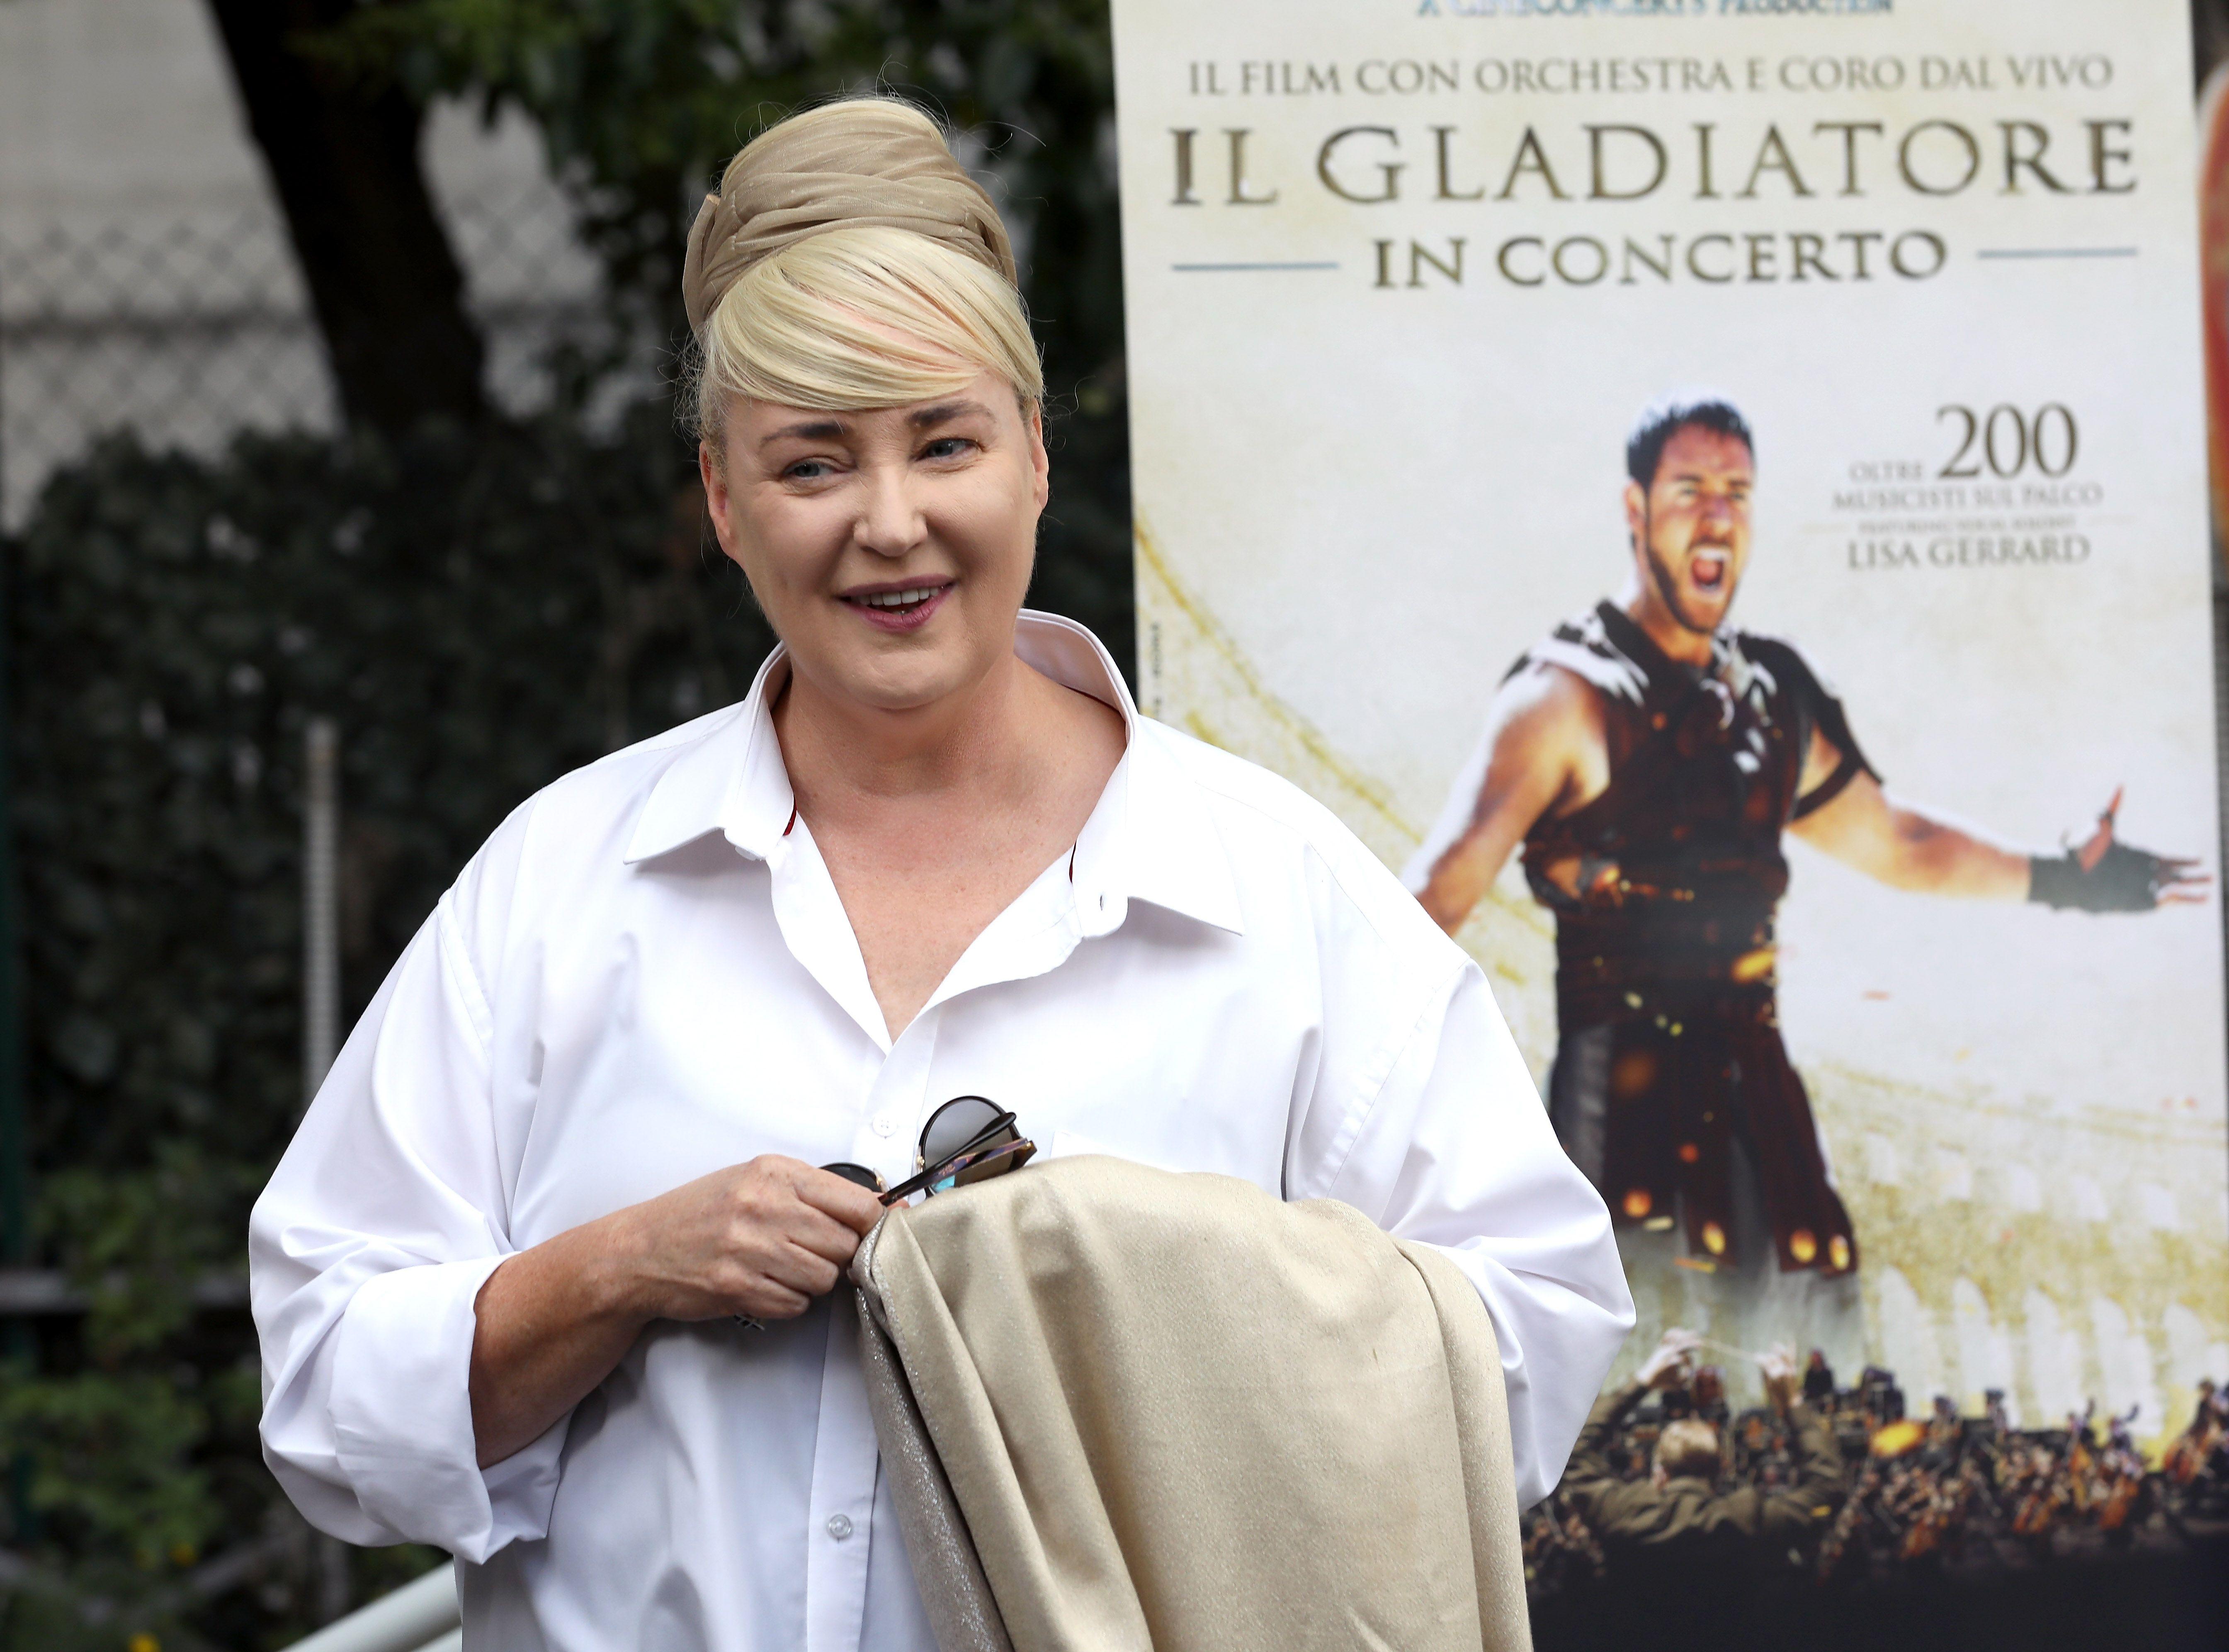 Lisa Gerrard arriving at Il Gladiatore In Concerto (Gladiator The Concert) Presentation In Rome